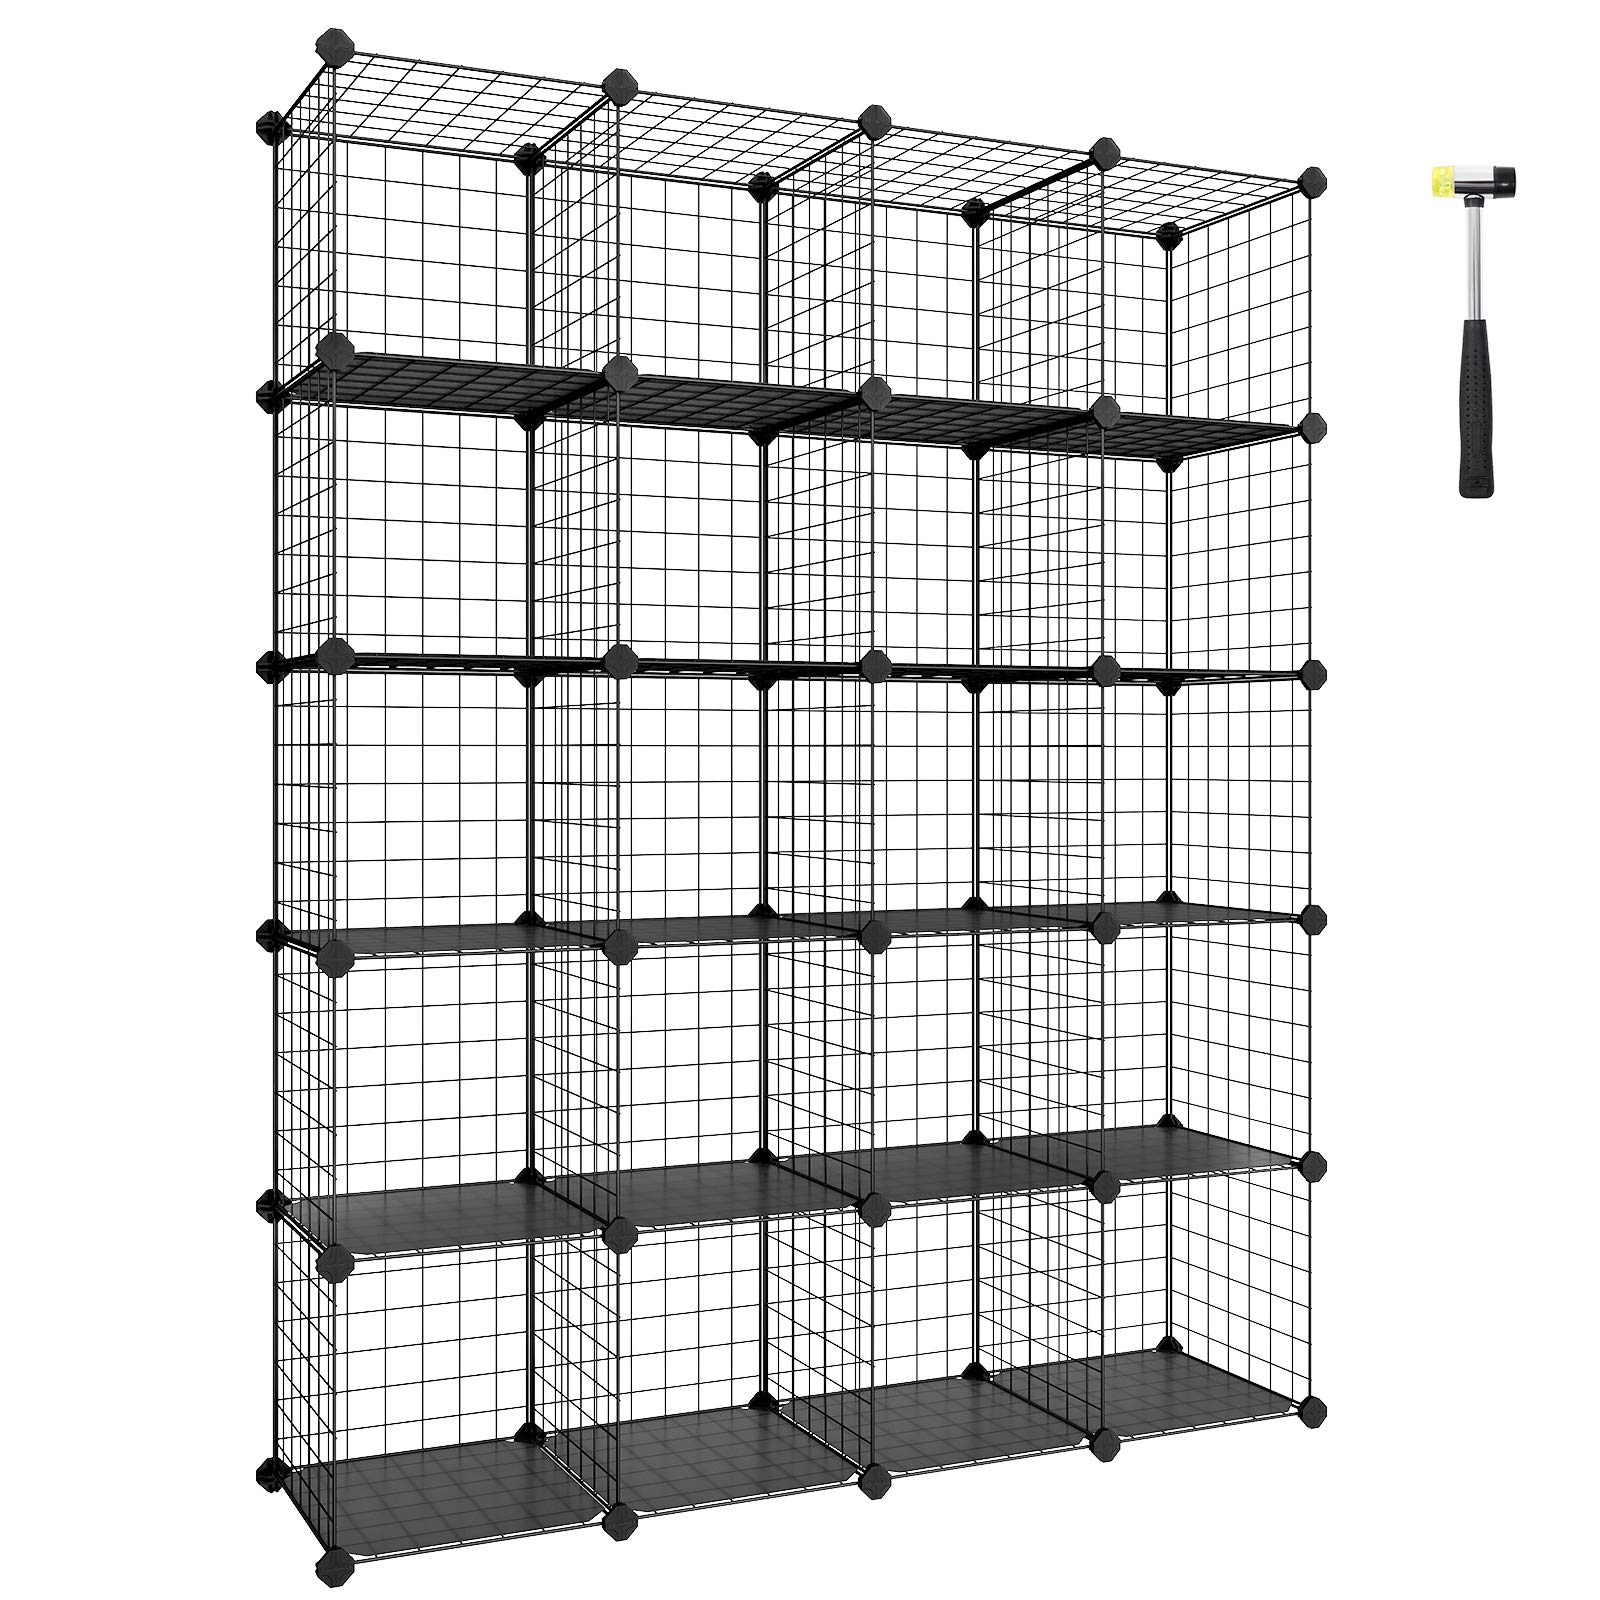 SONGMICS Wire Cube Storage, 20-Cube Modular Rack, Storage Shelves, PP Plastic Shelf Liners Included, 48.4'' L x 12.2'' W x 60.2'' H Black ULPI45H